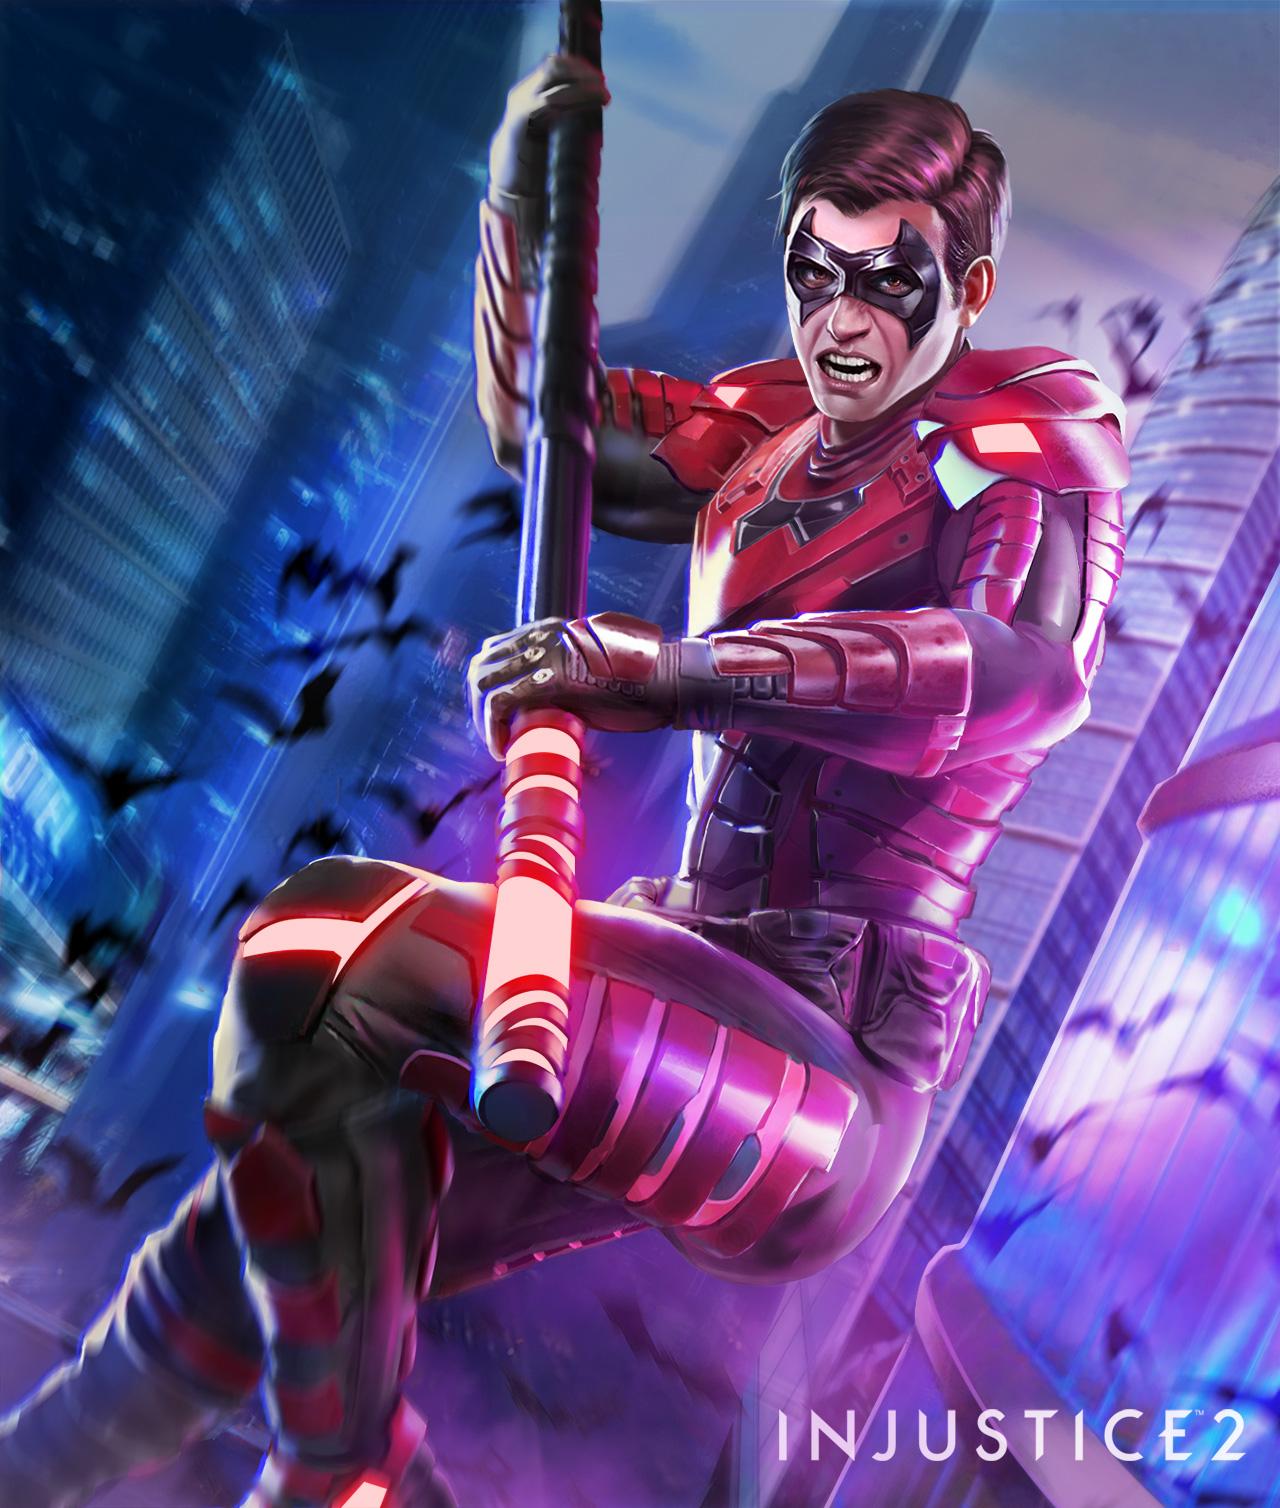 Injustice 2 Damian Wayne.jpg